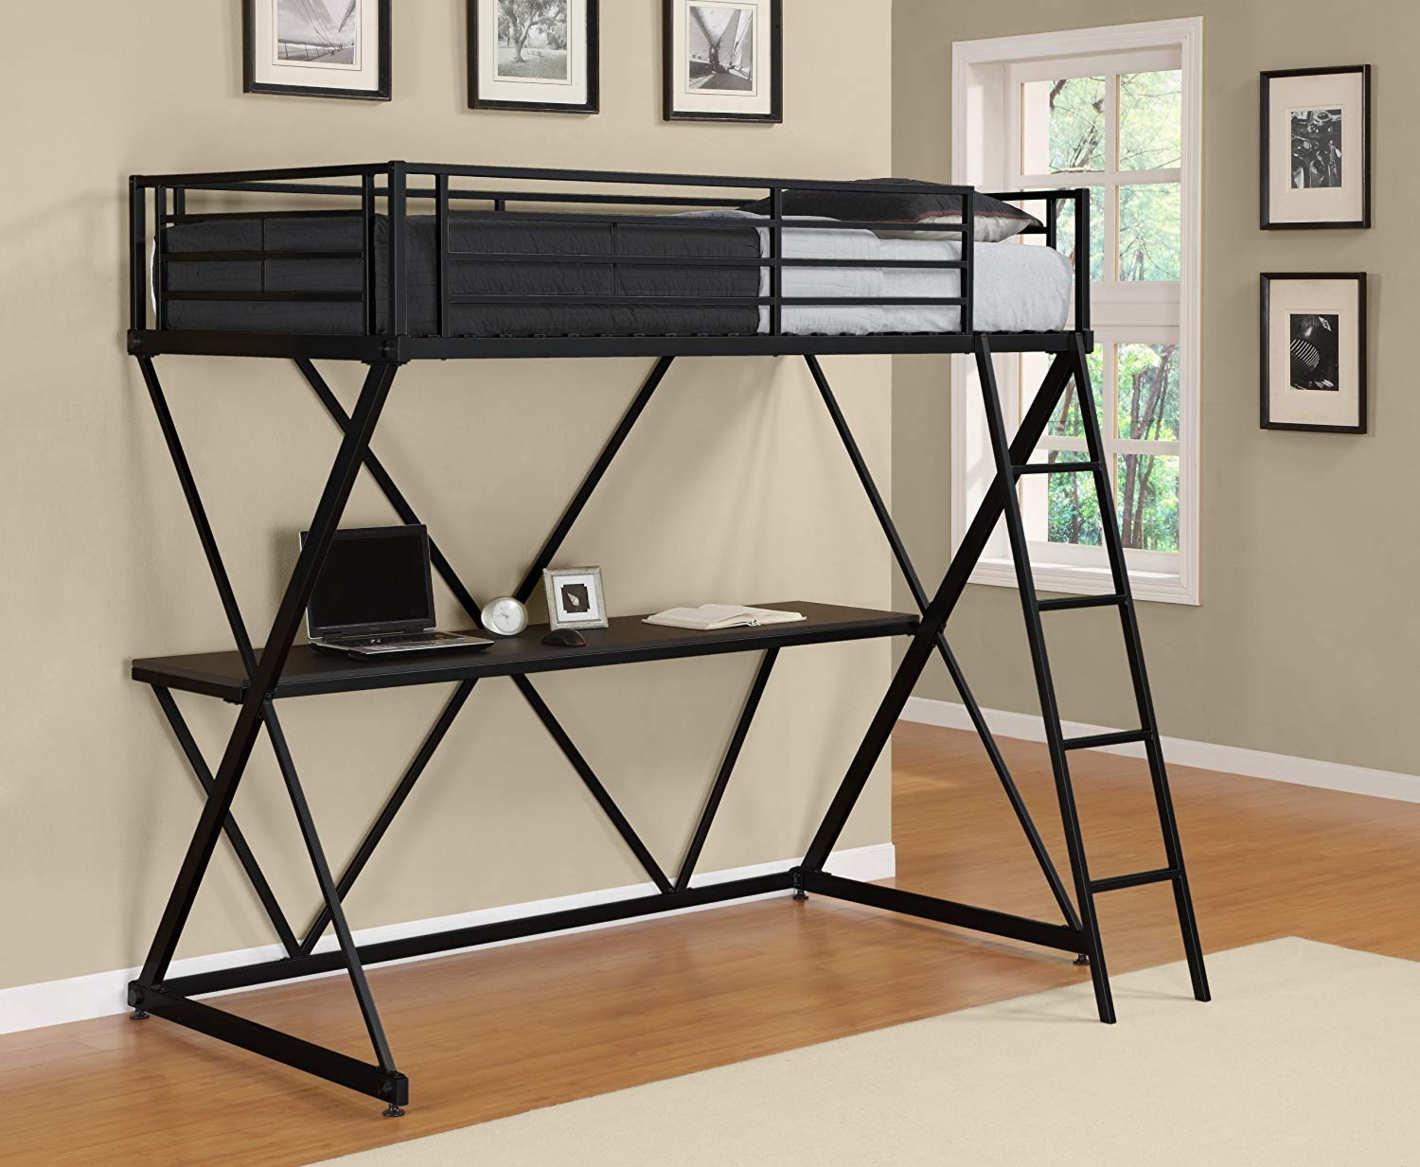 DHP X-Loft Metal Bunk Bed Frame with Desk. \u201c & 12 Best Loft Beds on Amazon: 2019